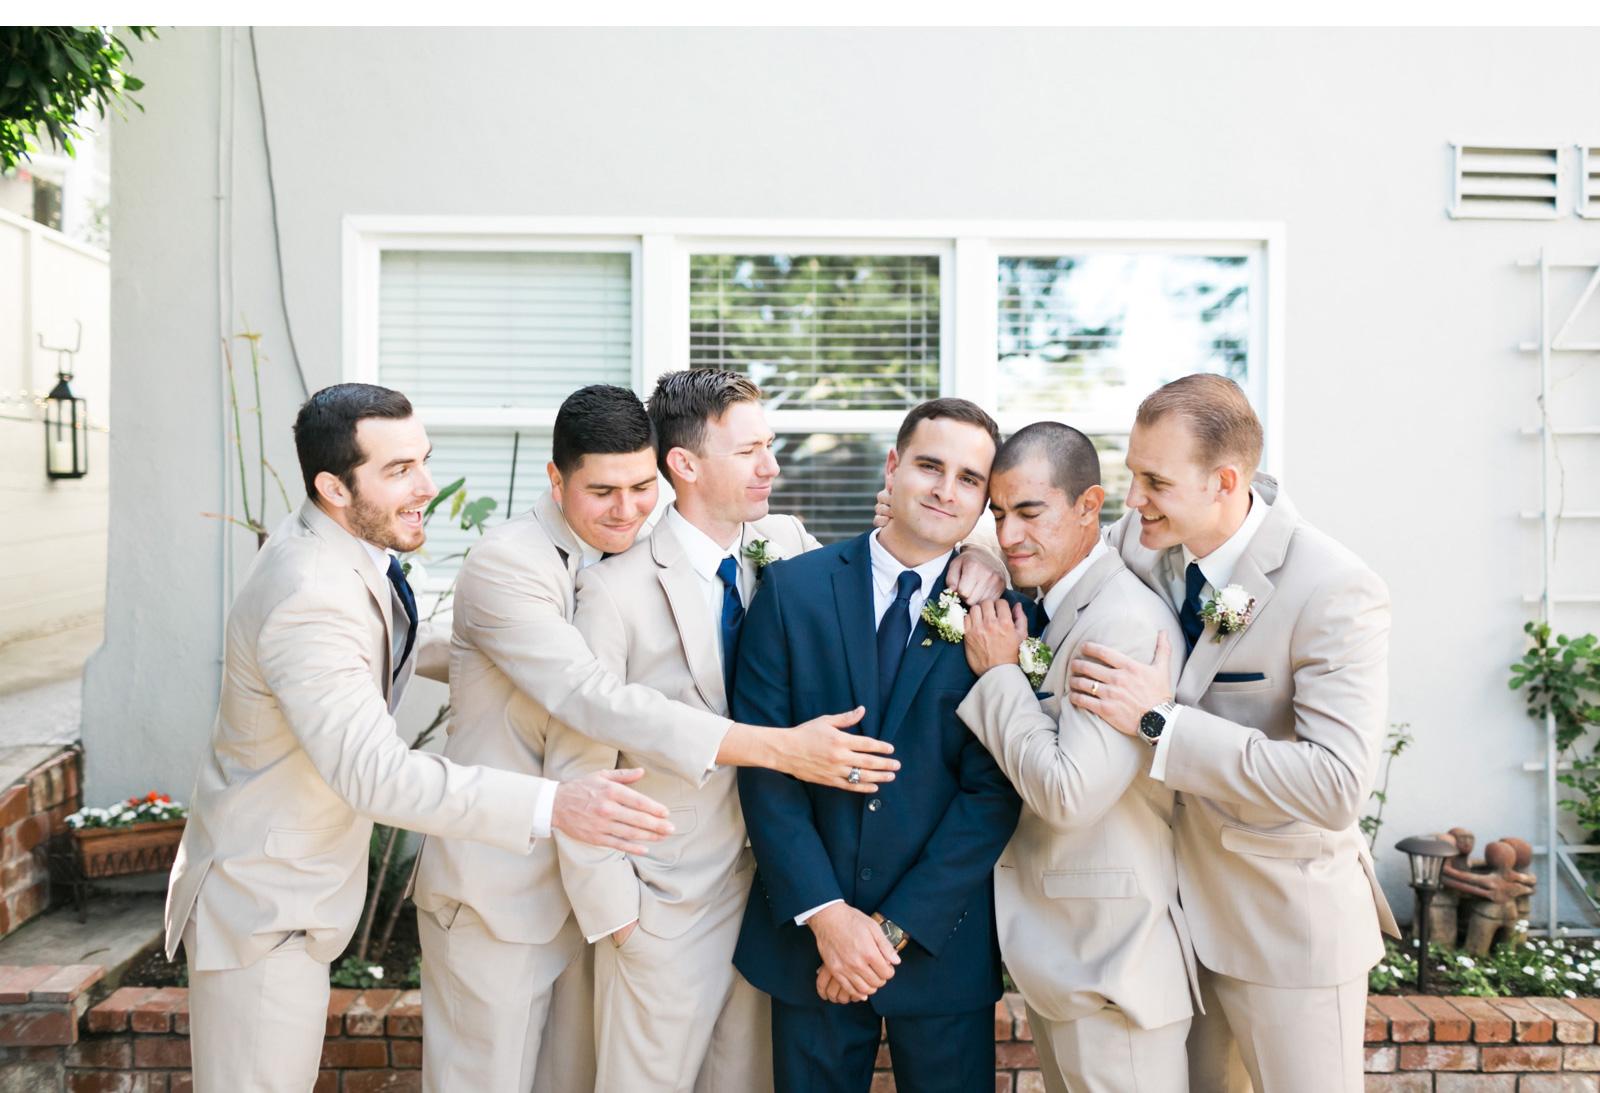 Private-Estate-Backyard-Wedding-Natalie-Schutt-Photography_05.jpg